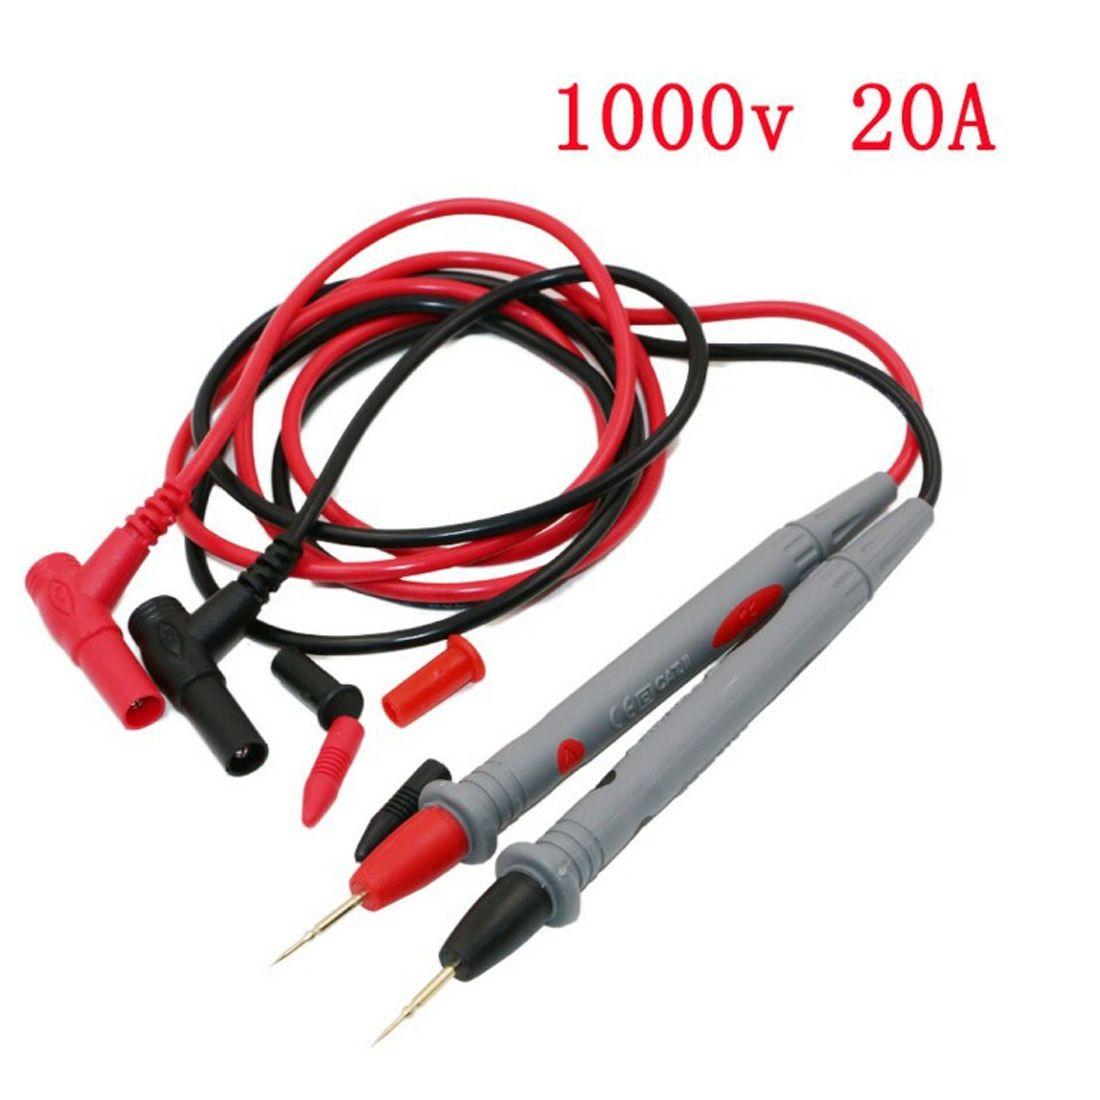 309 Universal Digital Multimeter 1000v 20a Test Lead Probe Cable Electrical Circuit Tester 9v Battery Ebay Smd Smt Needle Tip